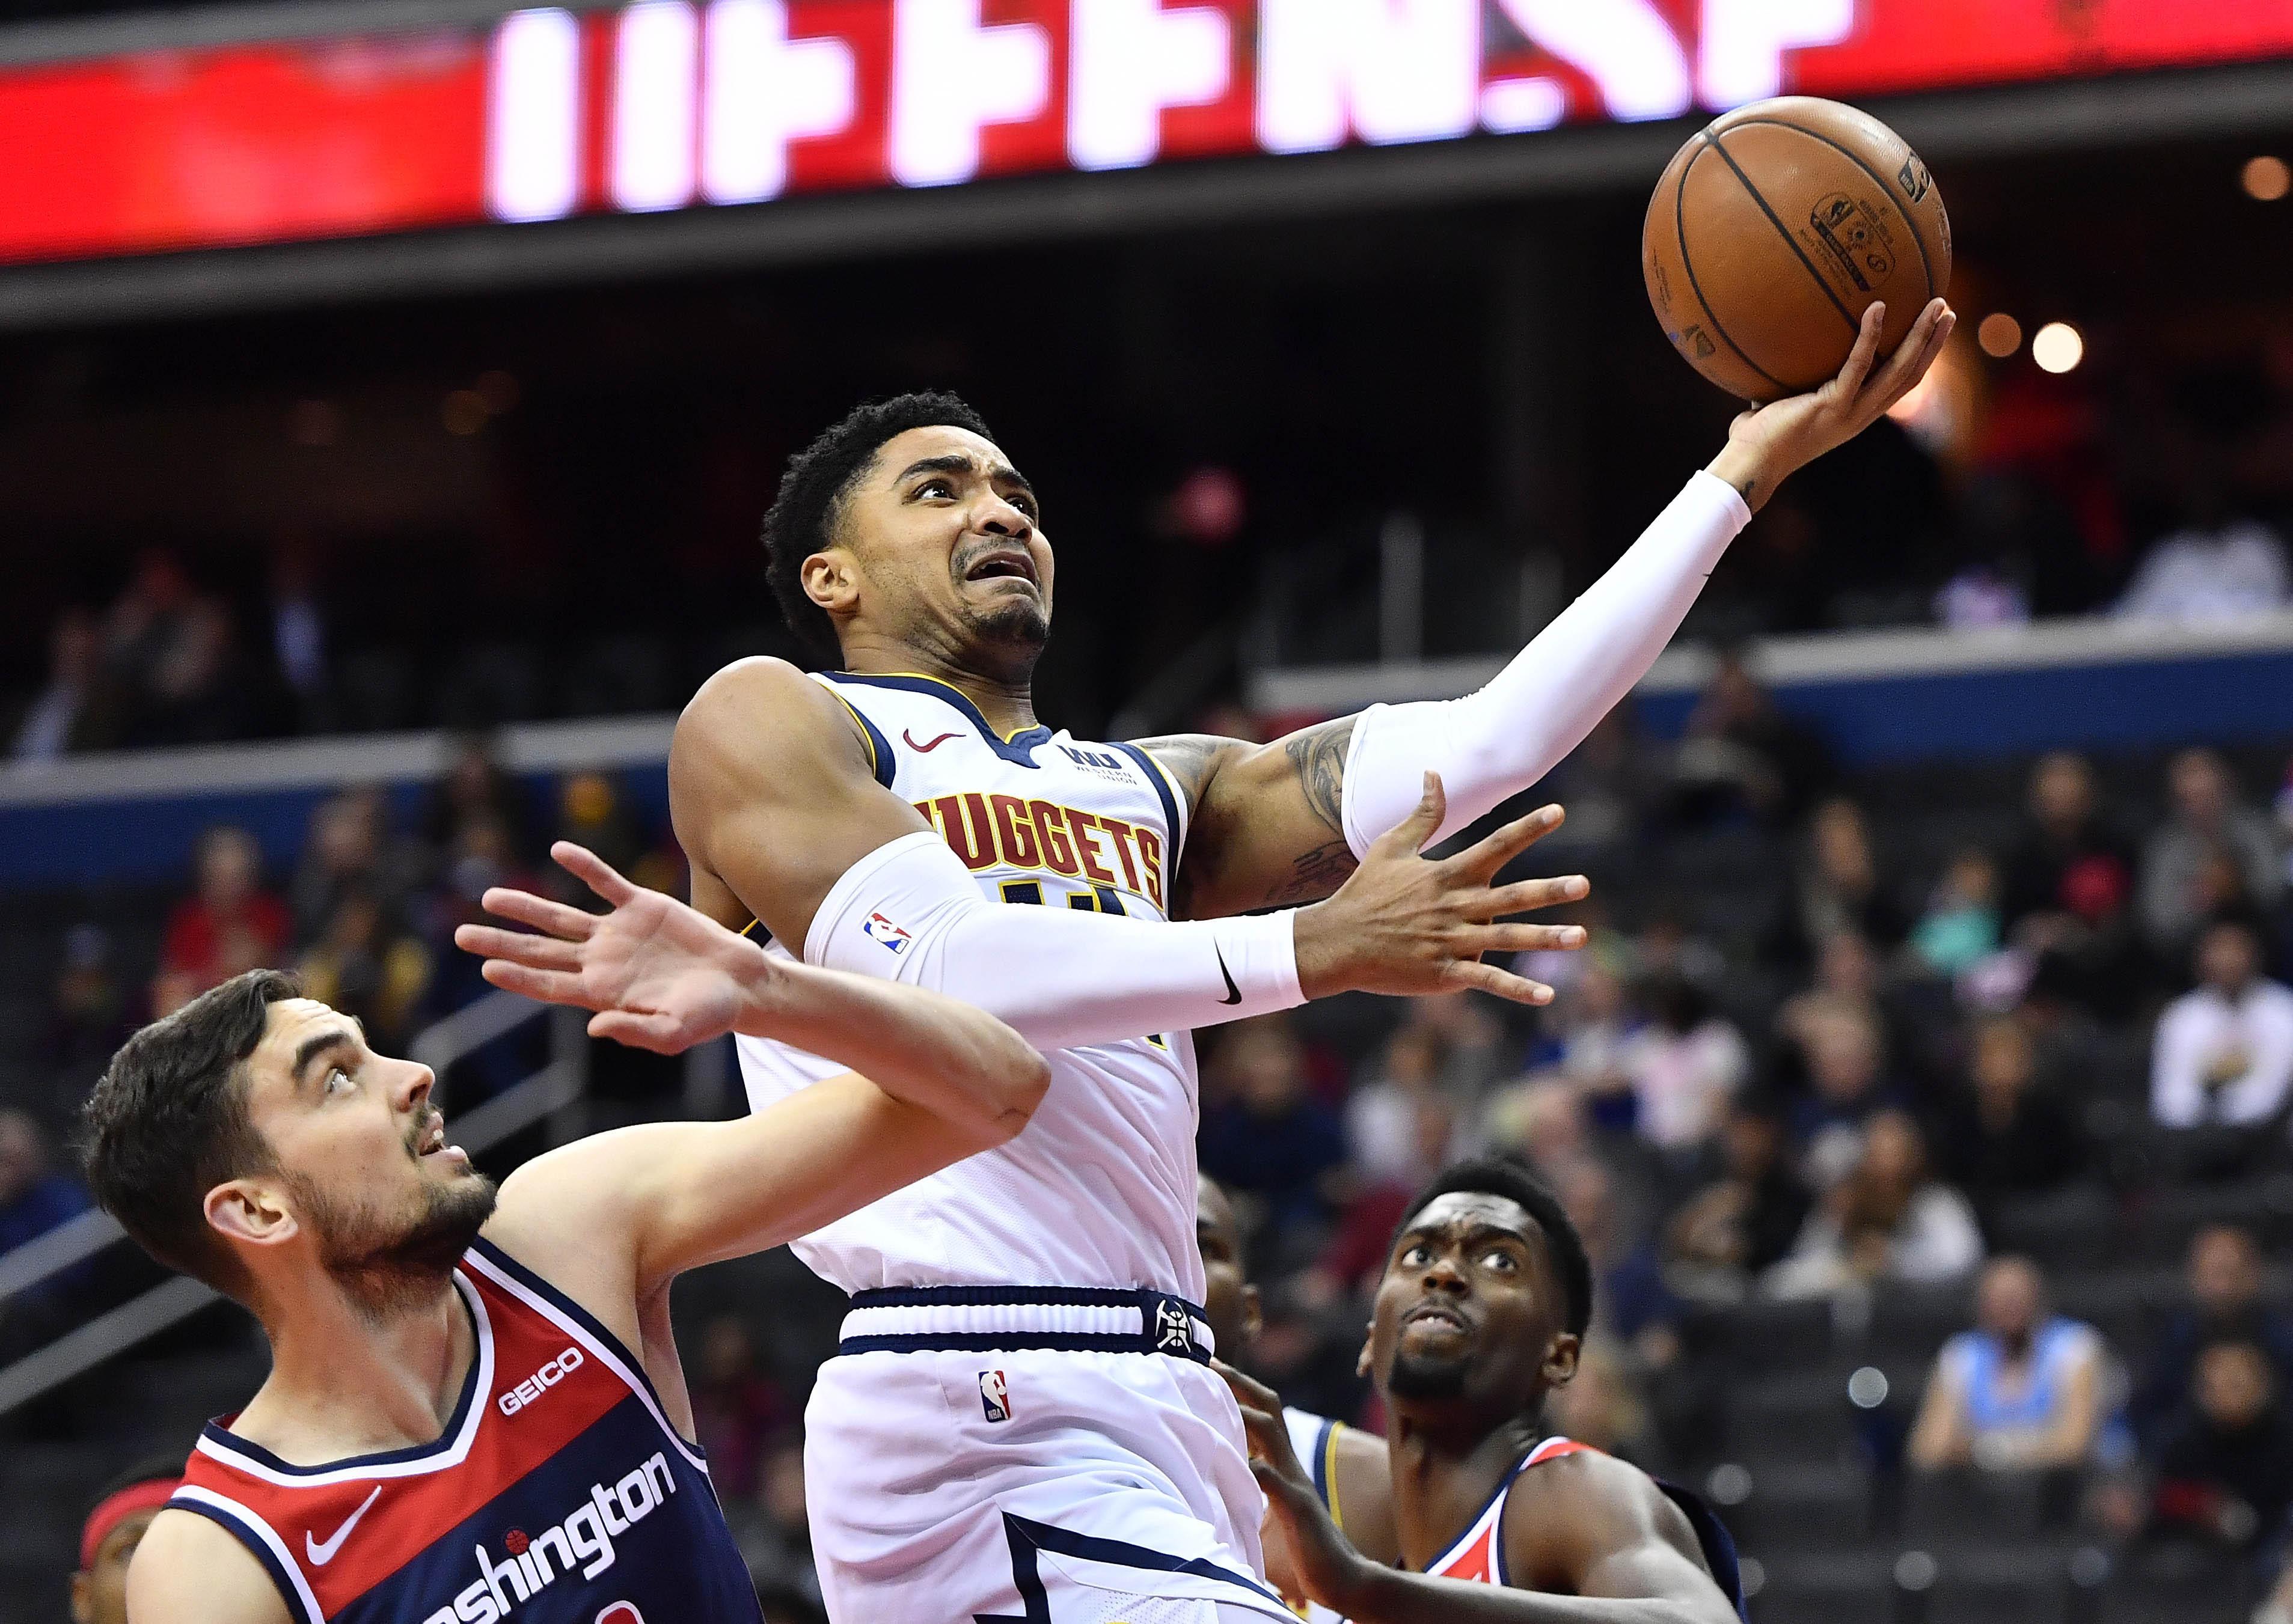 Denver Nuggets guard Gary Harris (14) shoots over Washington Wizards guard Tomas Satoransky (31) during the first half at Capital One Arena